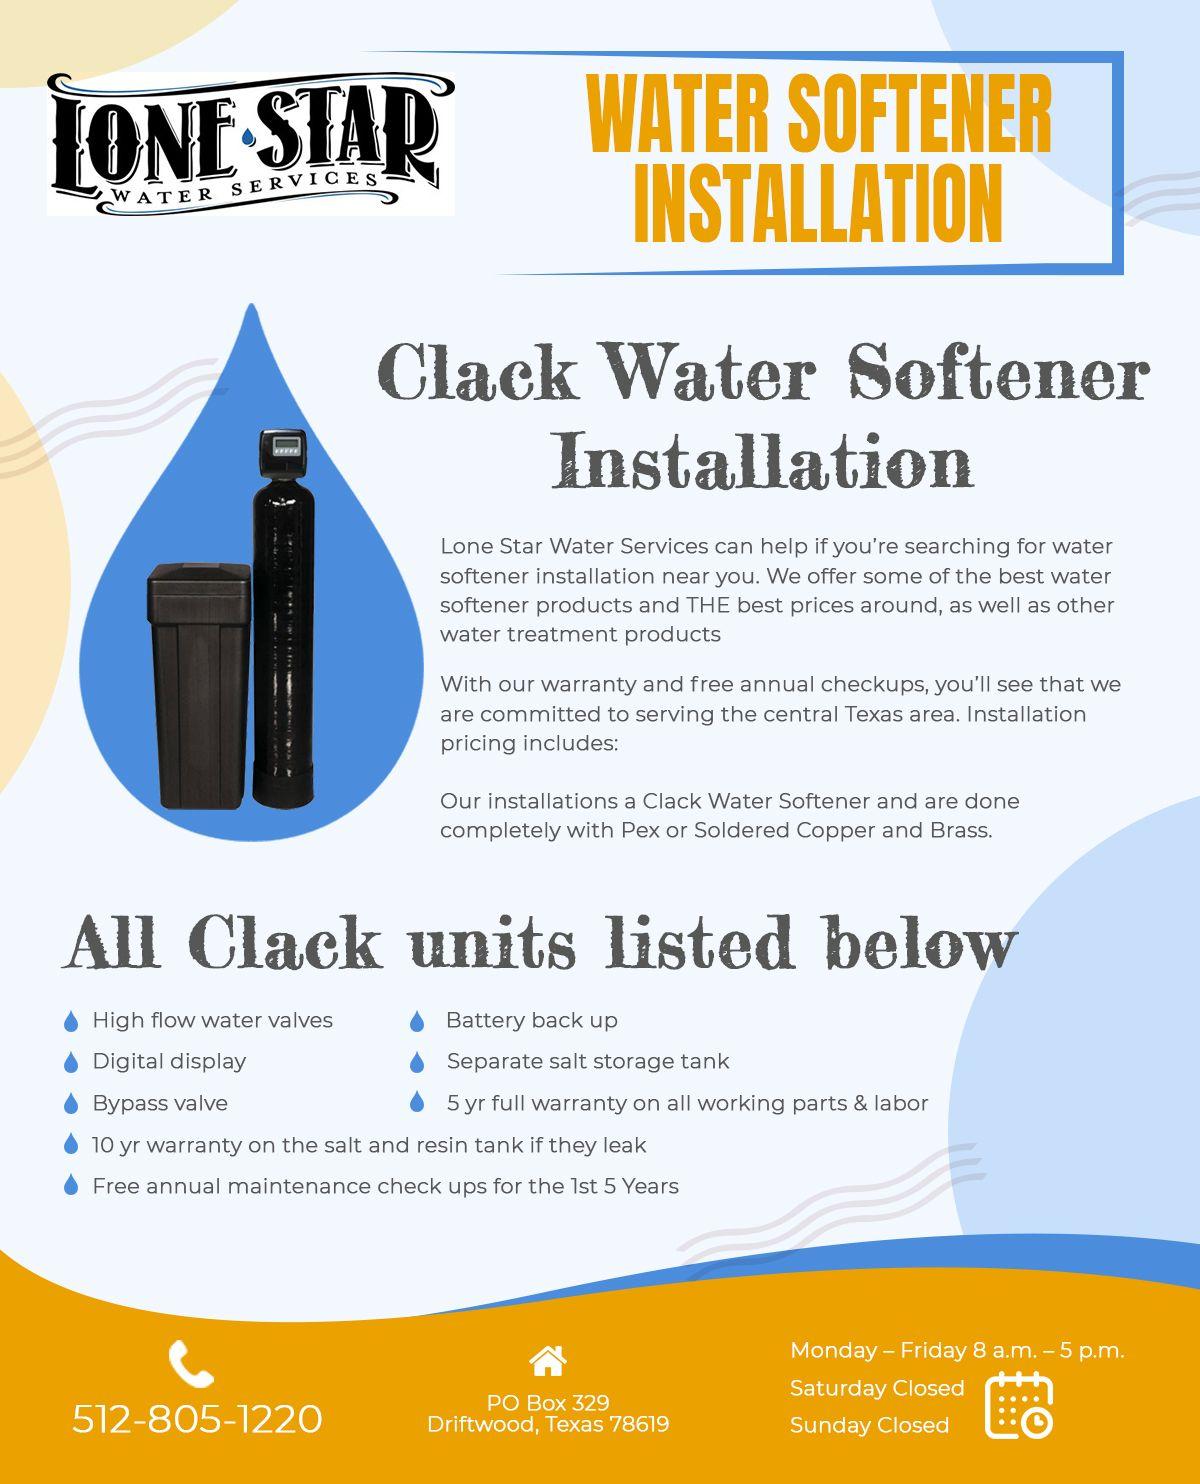 Water Softener Installation In 2020 Water Softener Water Treatment Softener